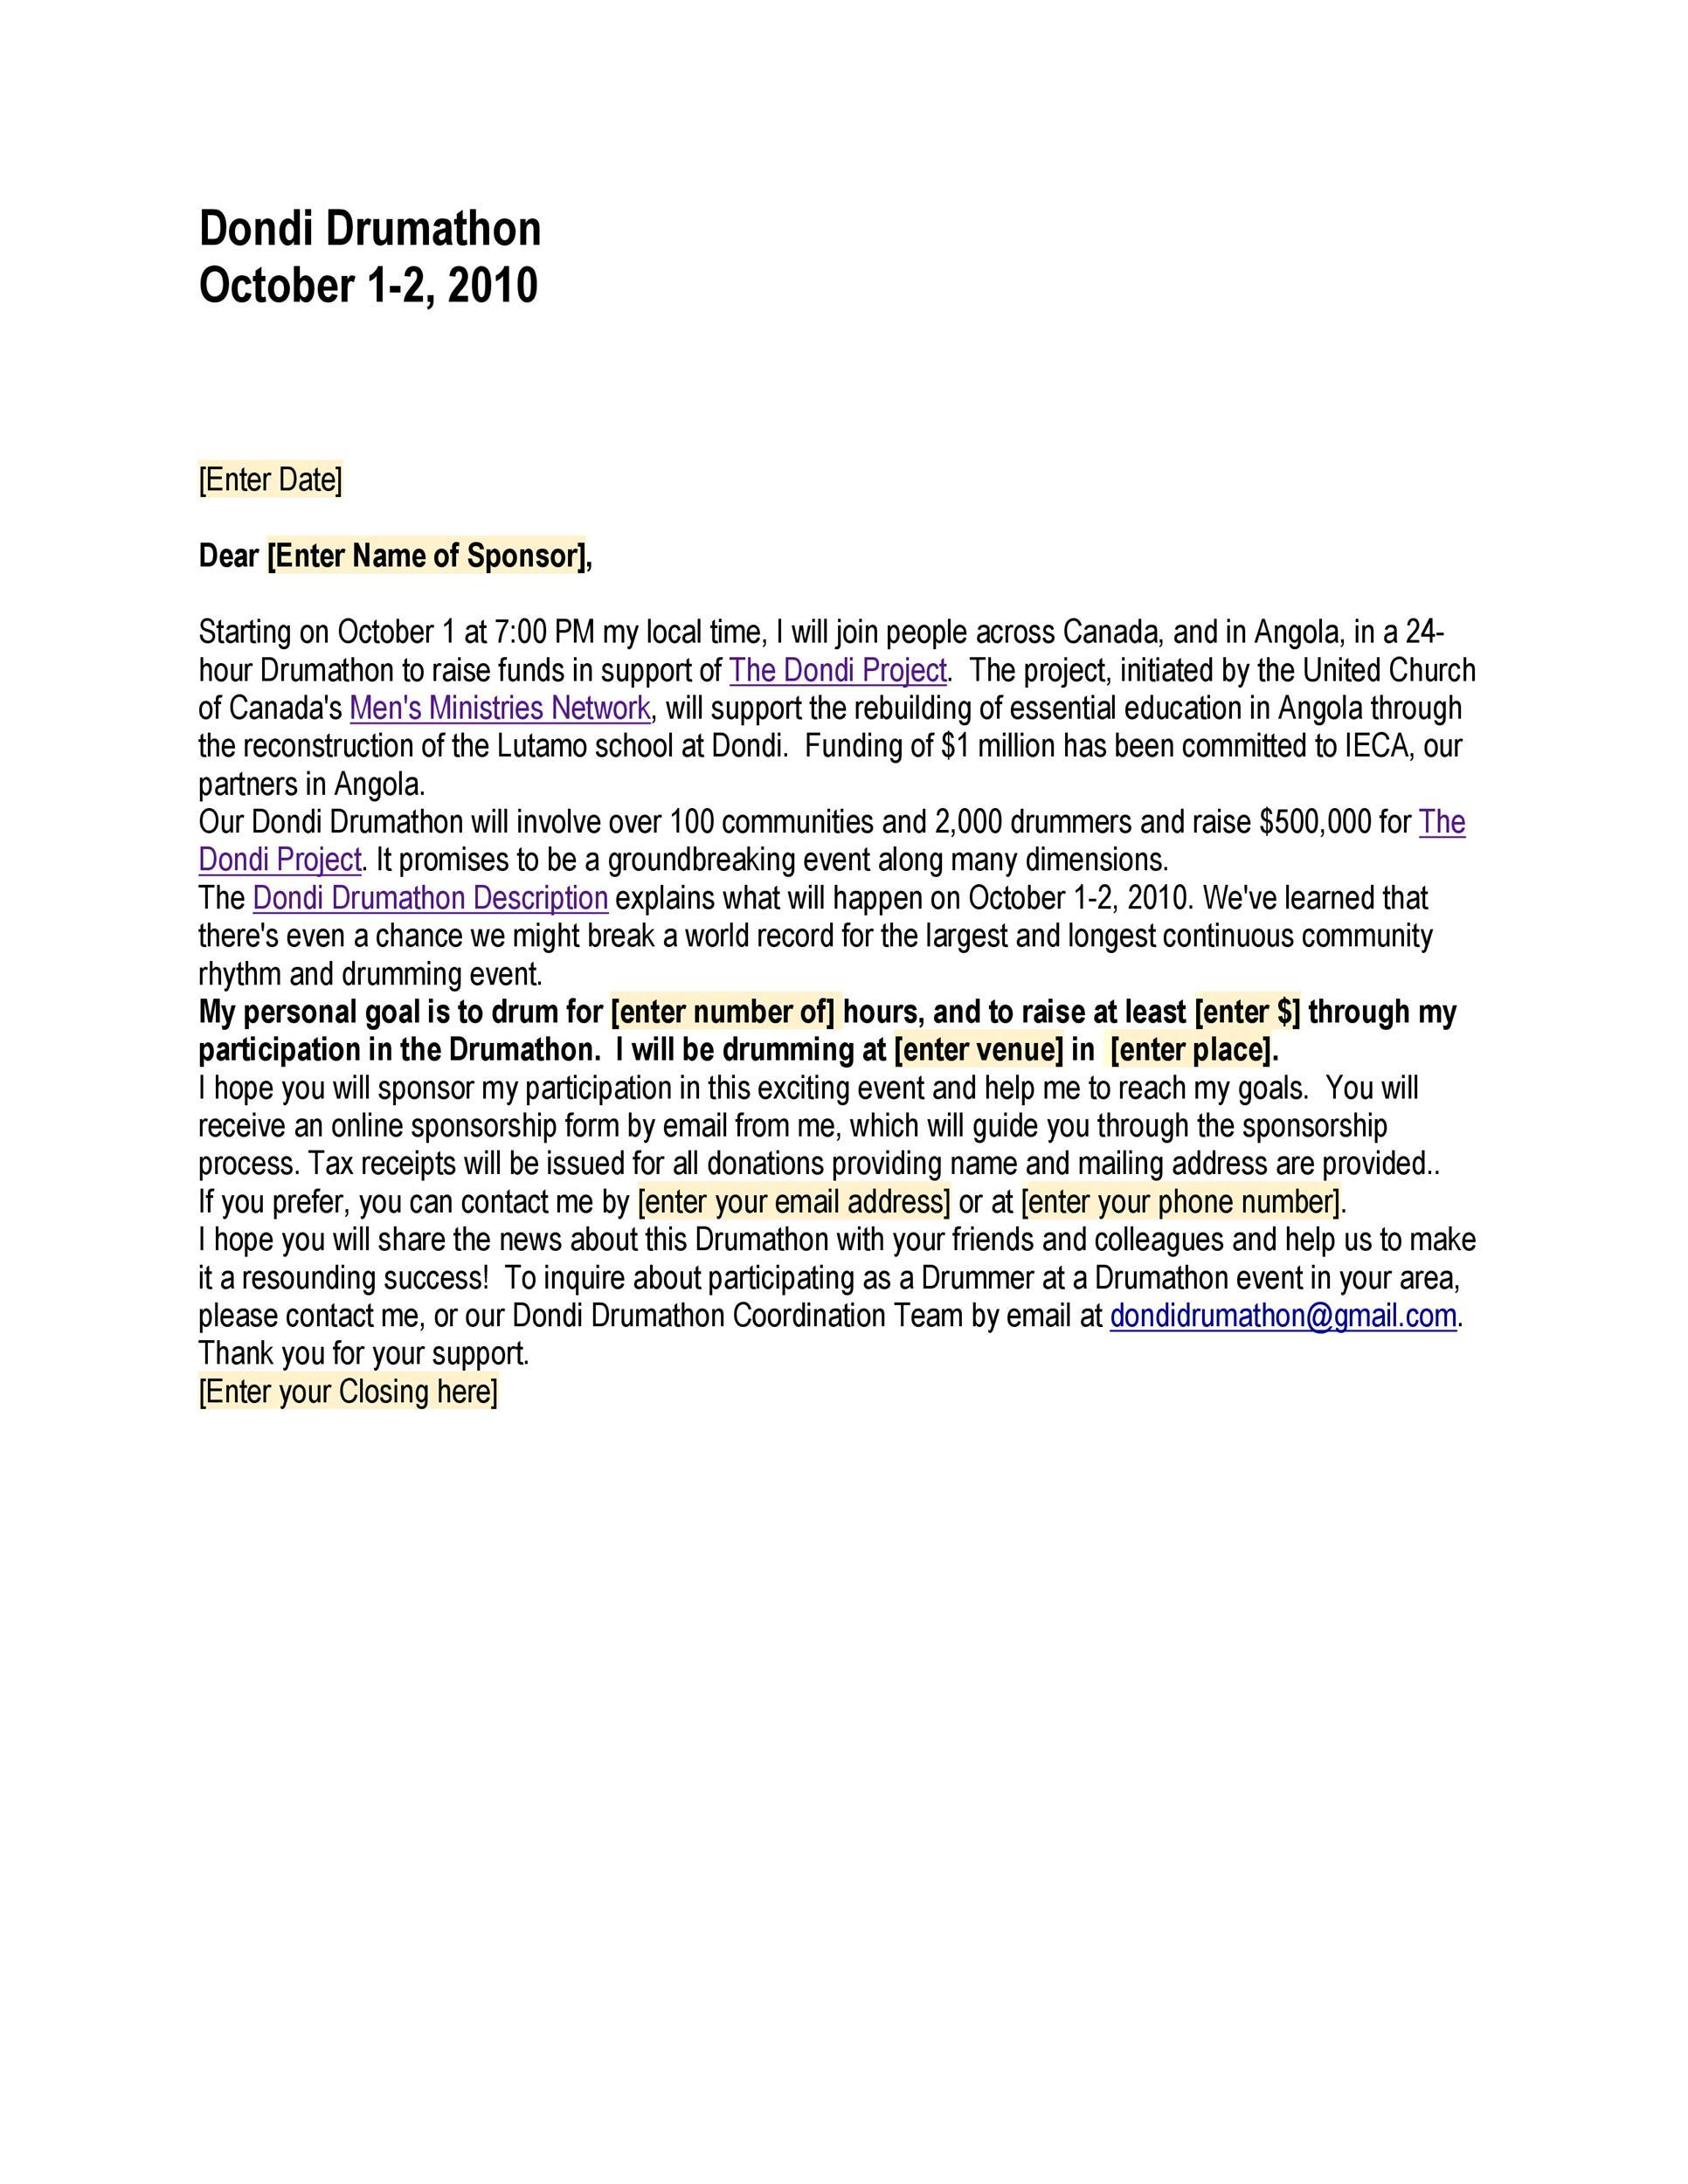 Free Sponsorship Letter Template 01